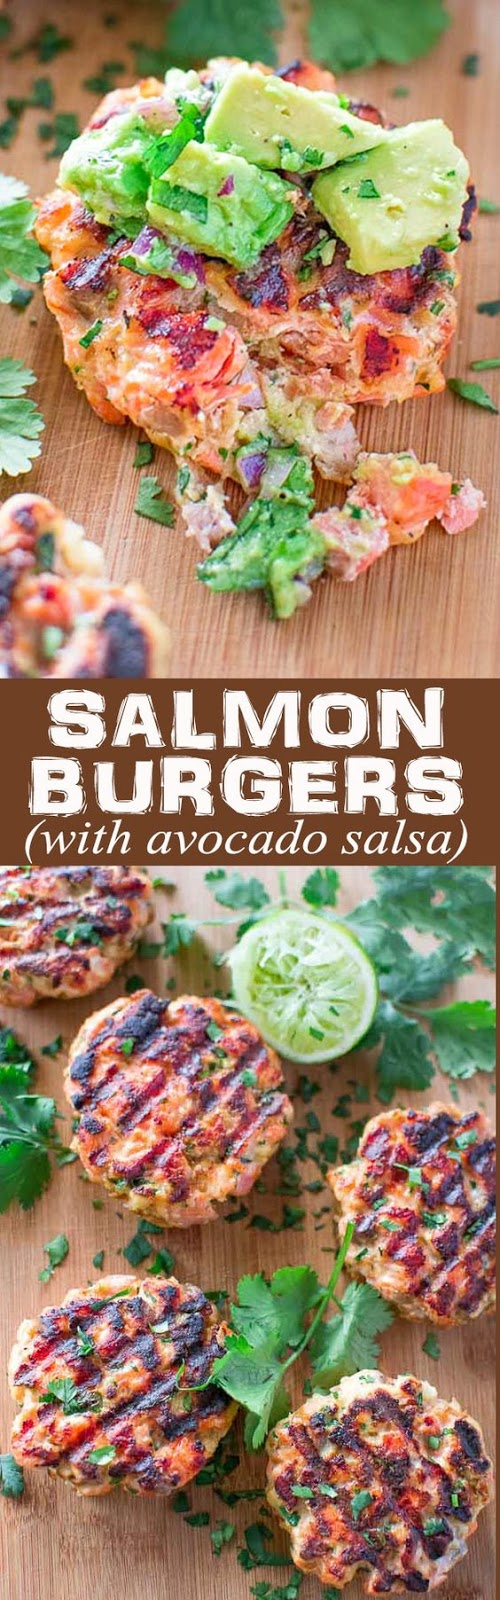 ★★★★☆ 1382 ratings    | SALMON BURGERS WITH AVOCADO SALSA #SALMON #BURGERS #AVOCADO #SALSA #PATTY #HEALTHY